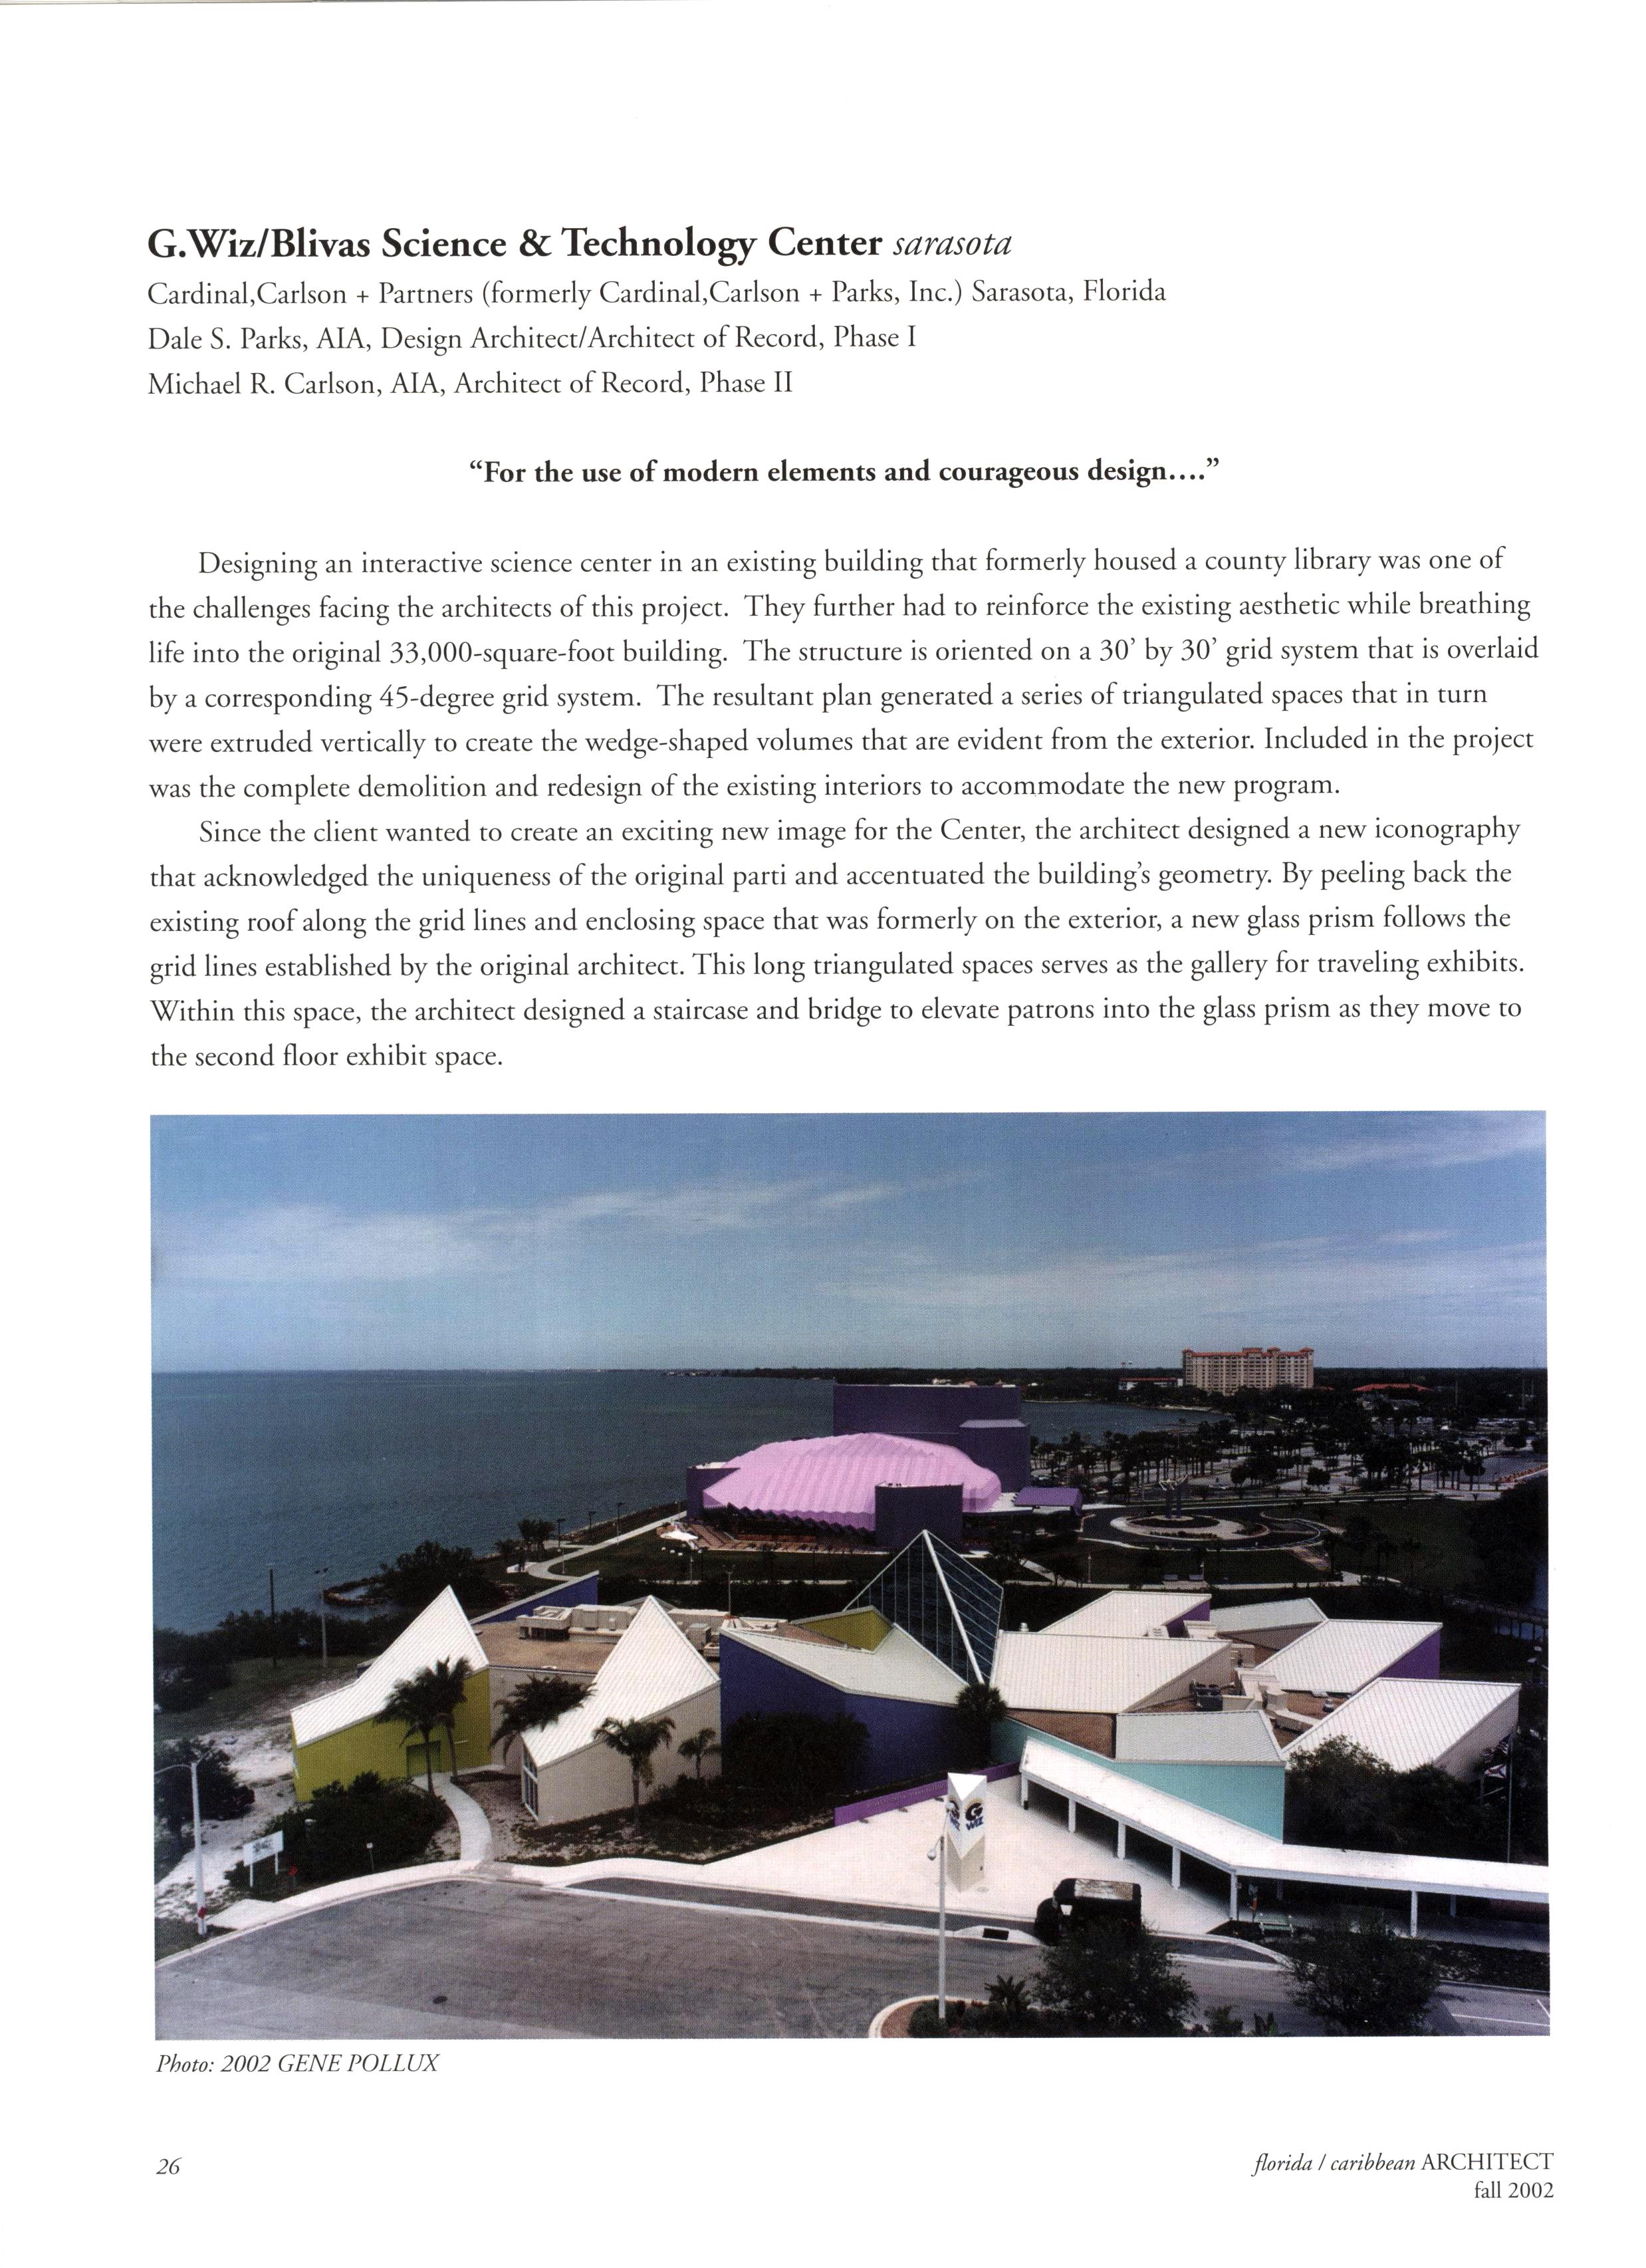 Florida Architect 2002 (Publications) 002 SC-10.jpg